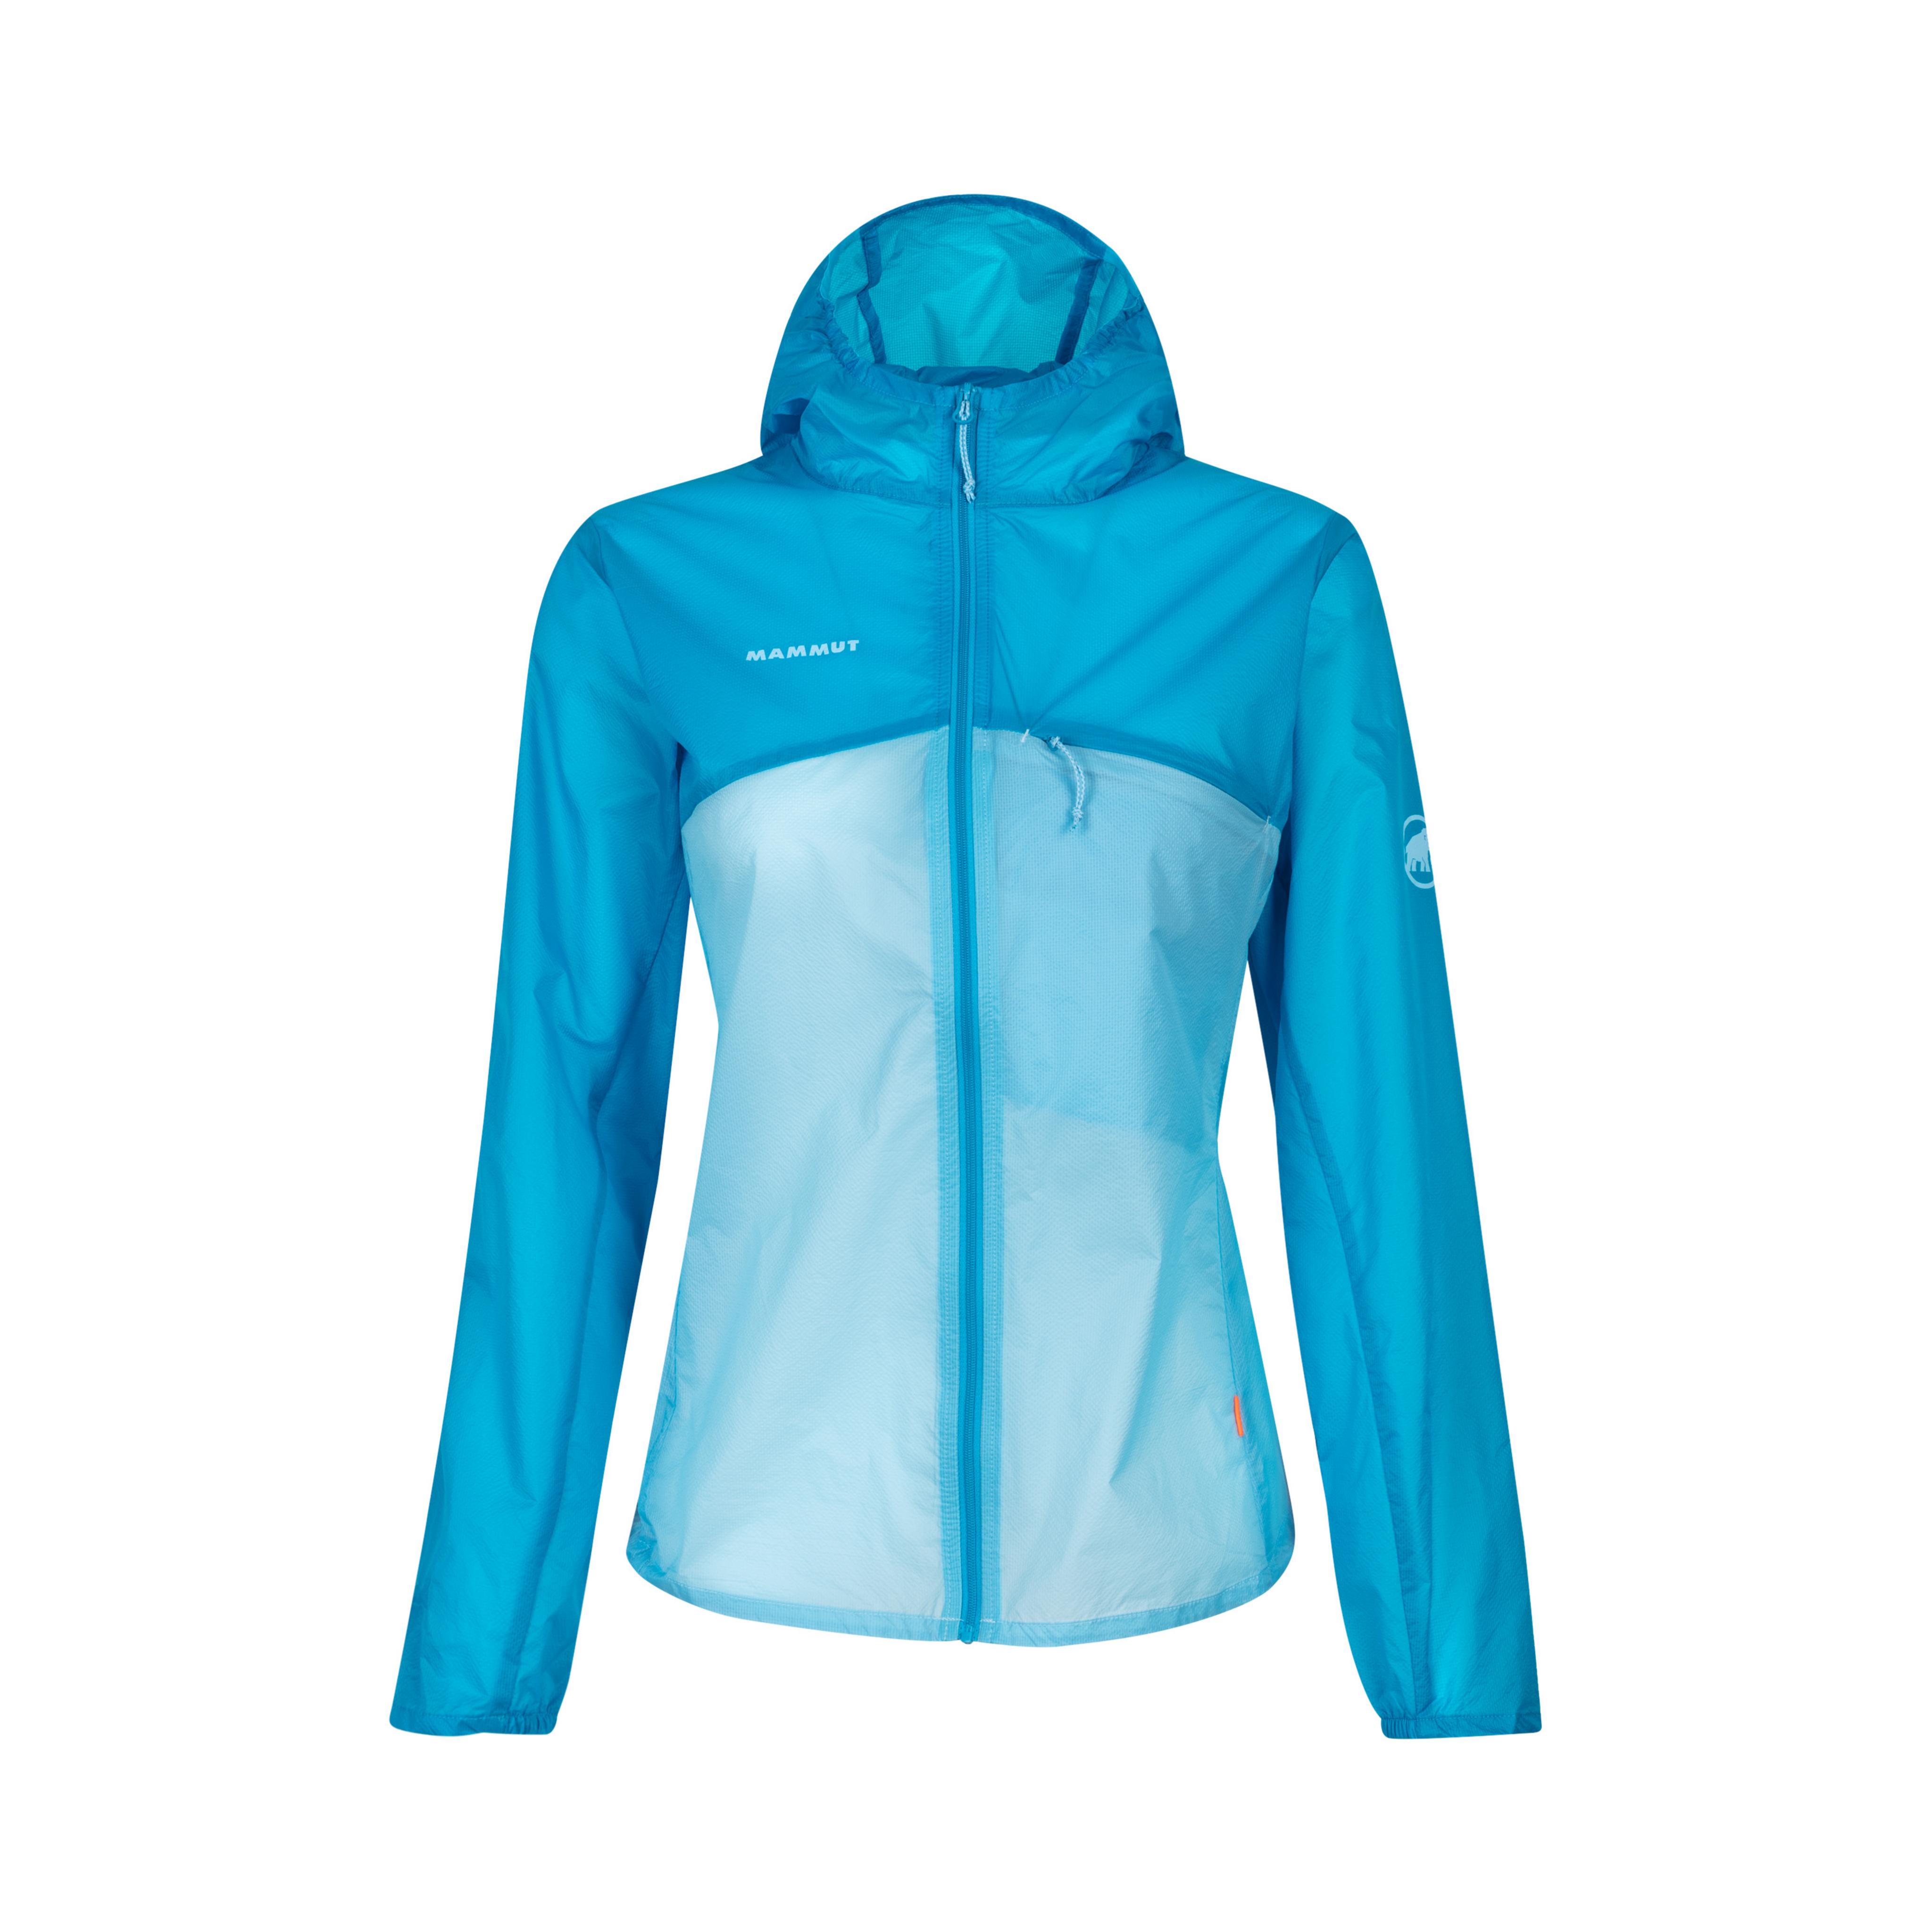 Convey WB Hooded Jacket Women - ocean-whisper, XS thumbnail